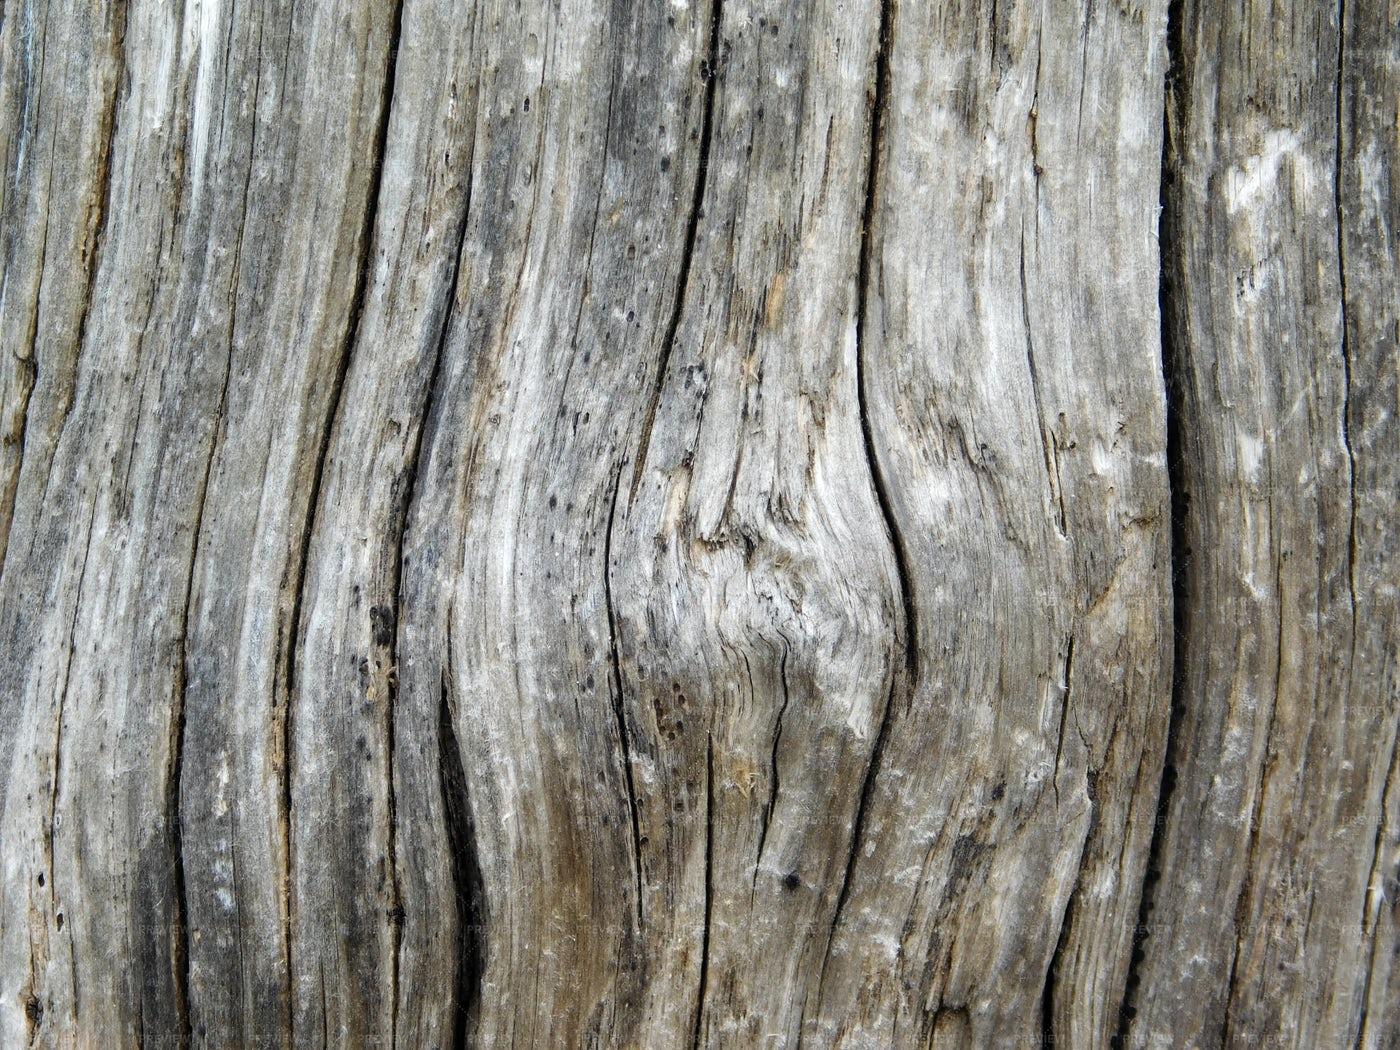 Tree Trunk Texture: Stock Photos